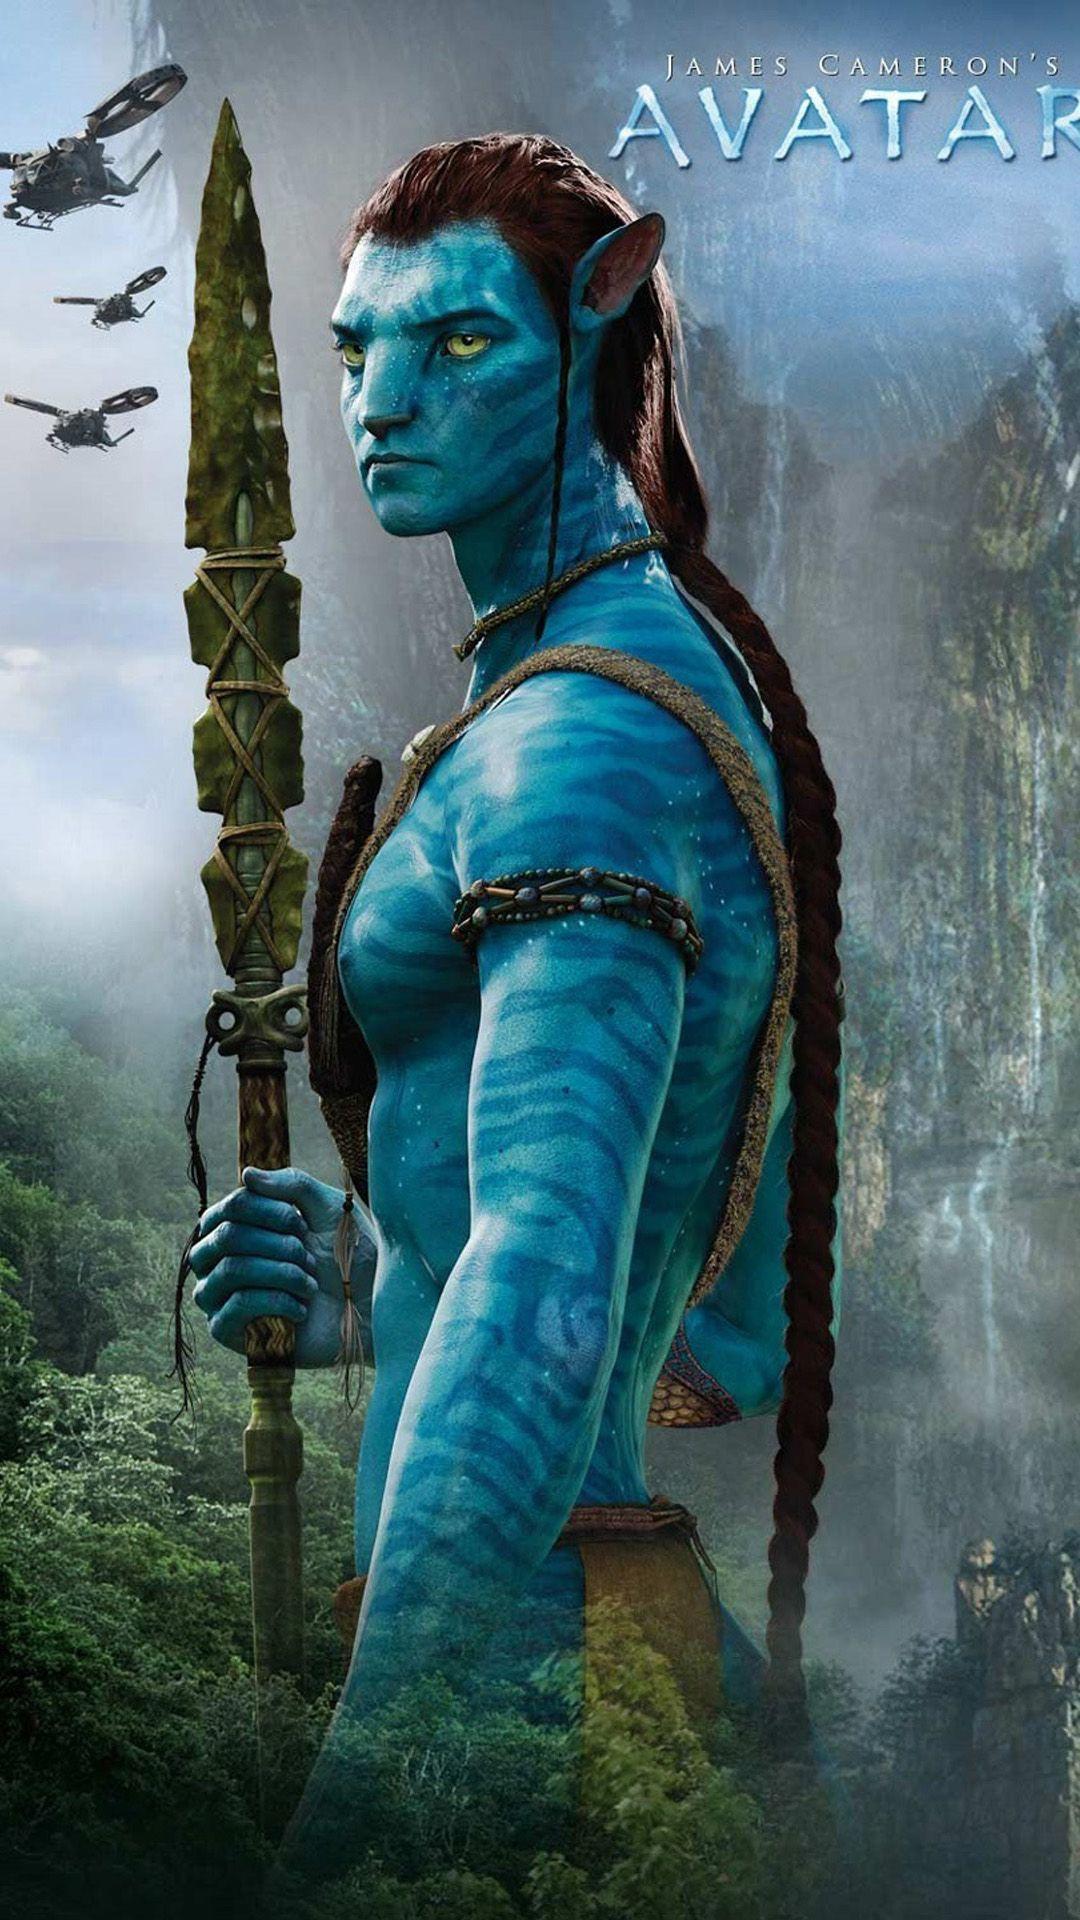 Avatar Movie Hd Wallpaper | Fan Of Things in 2019 | Avatar, Avatar movie, Avatar tattoo